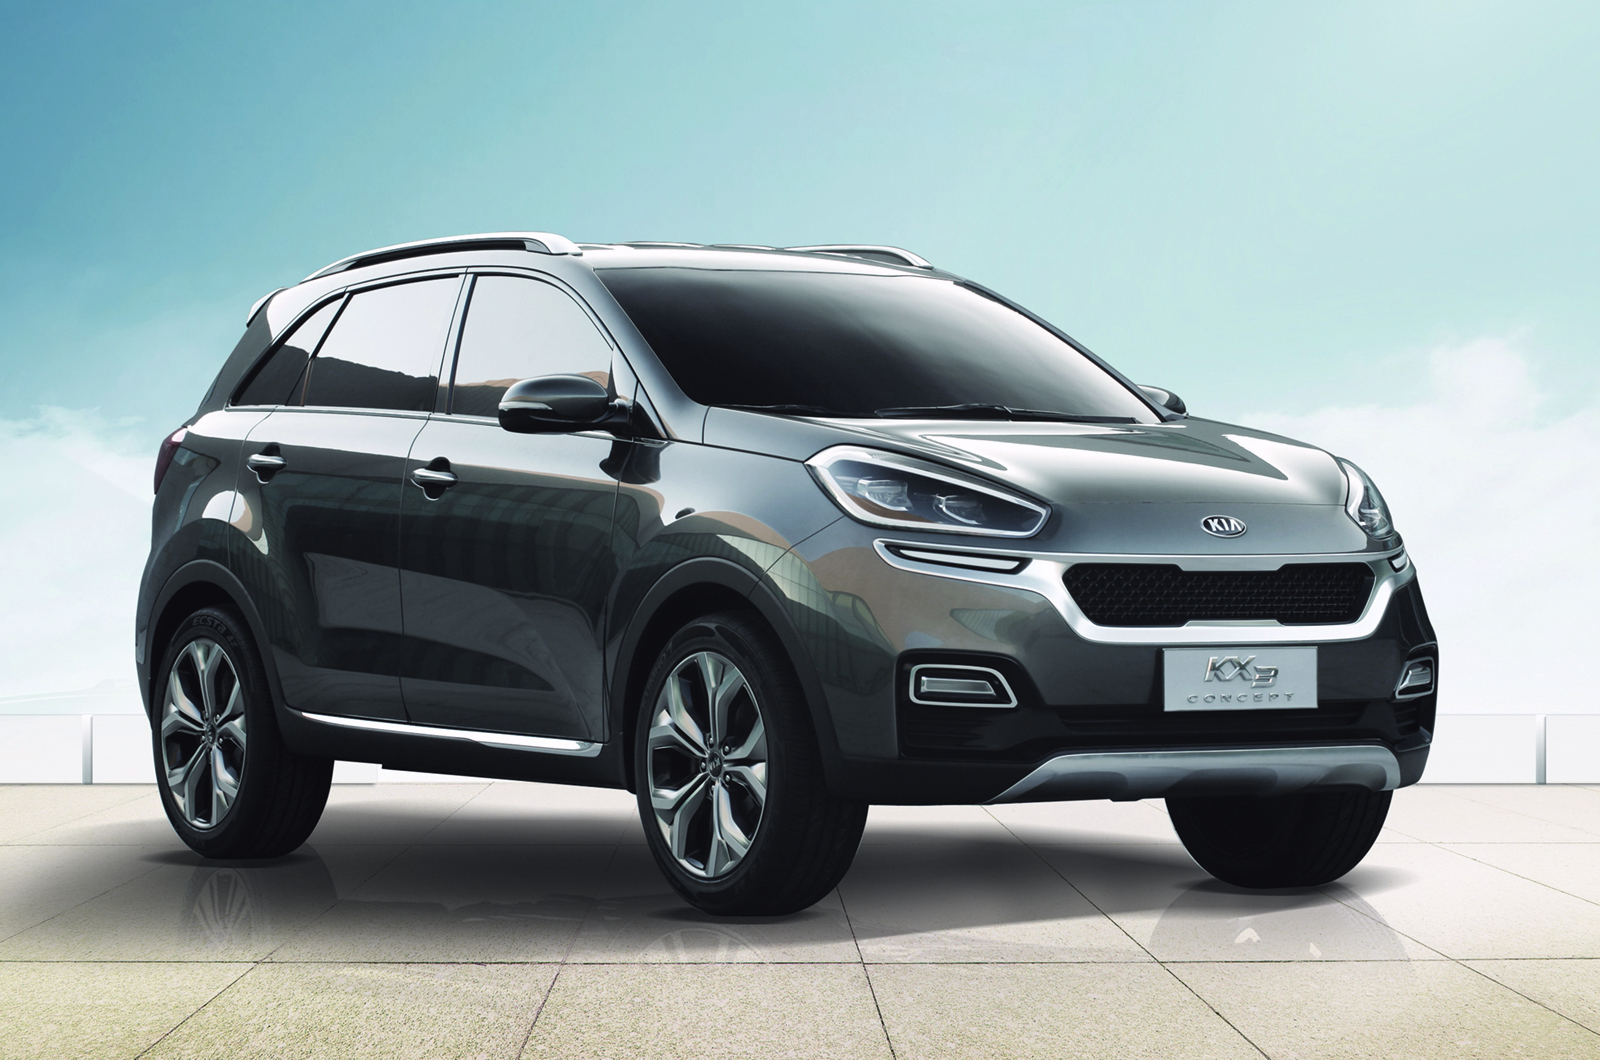 Kia Kx3 Suv Concept Revealed At Guangzhou Motor Show Car